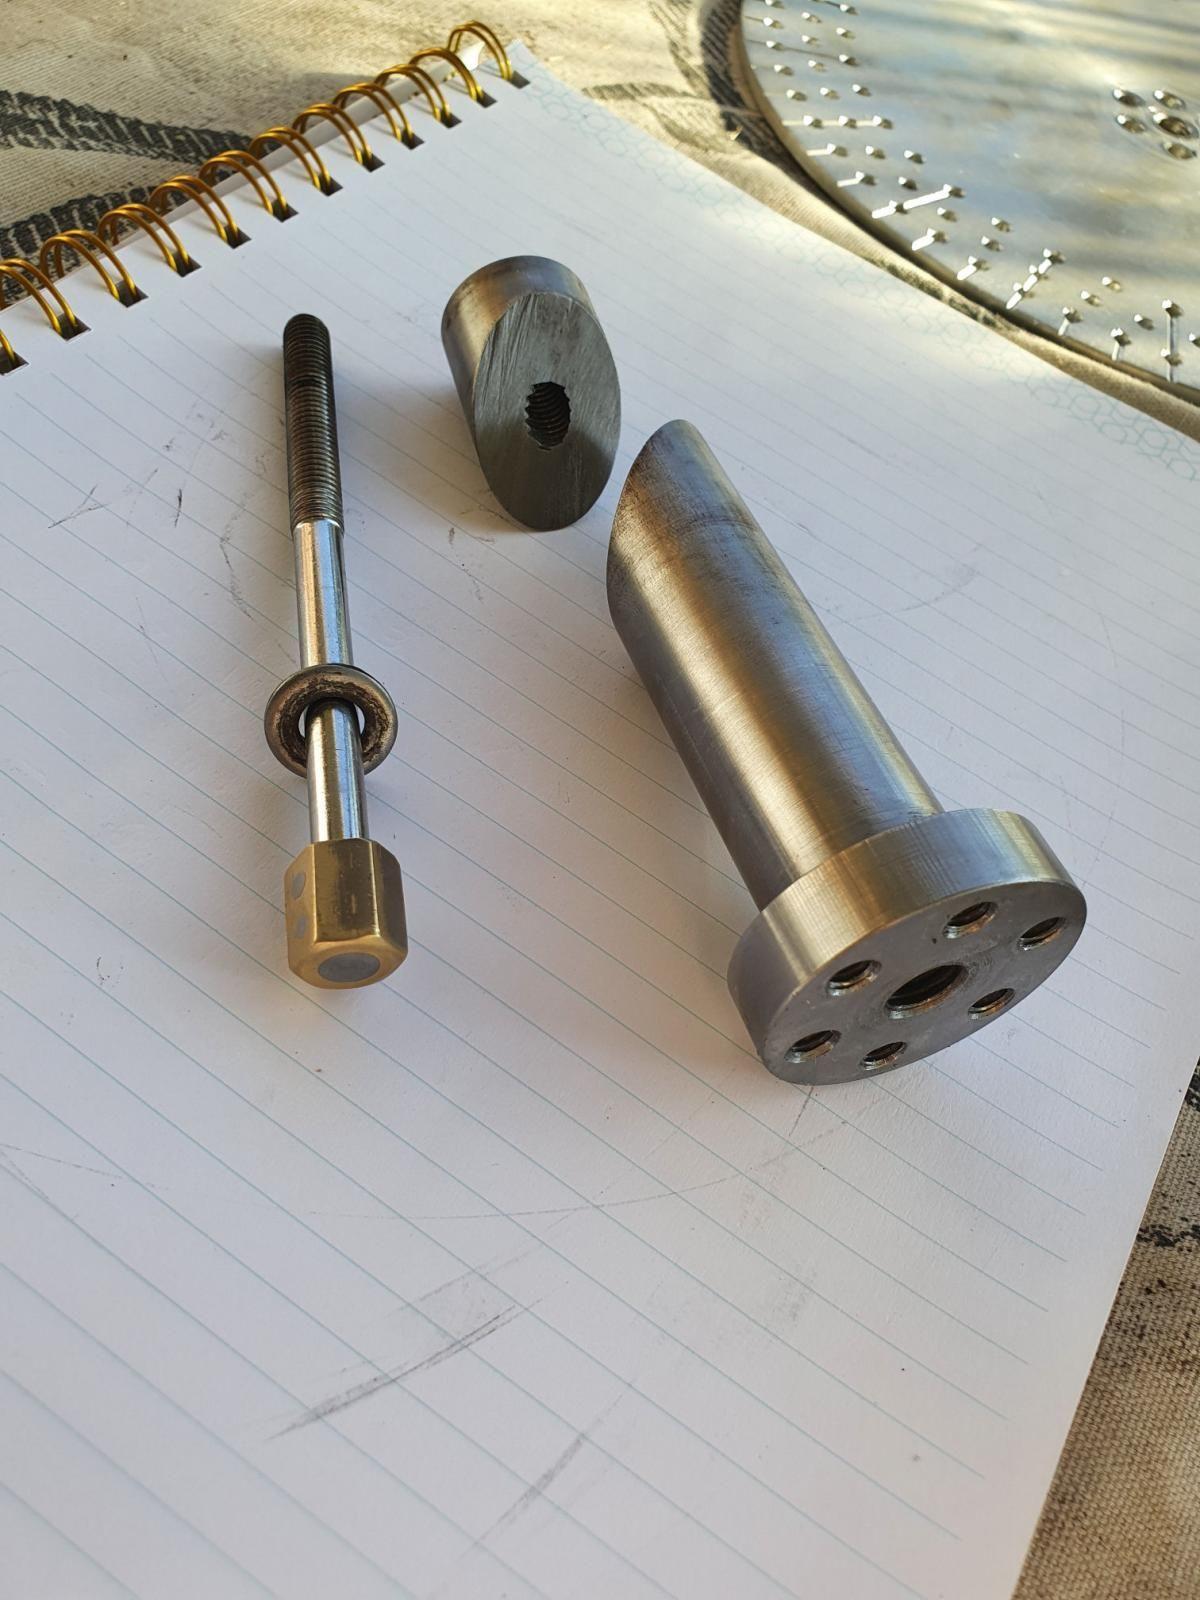 Pin on Lathe tools